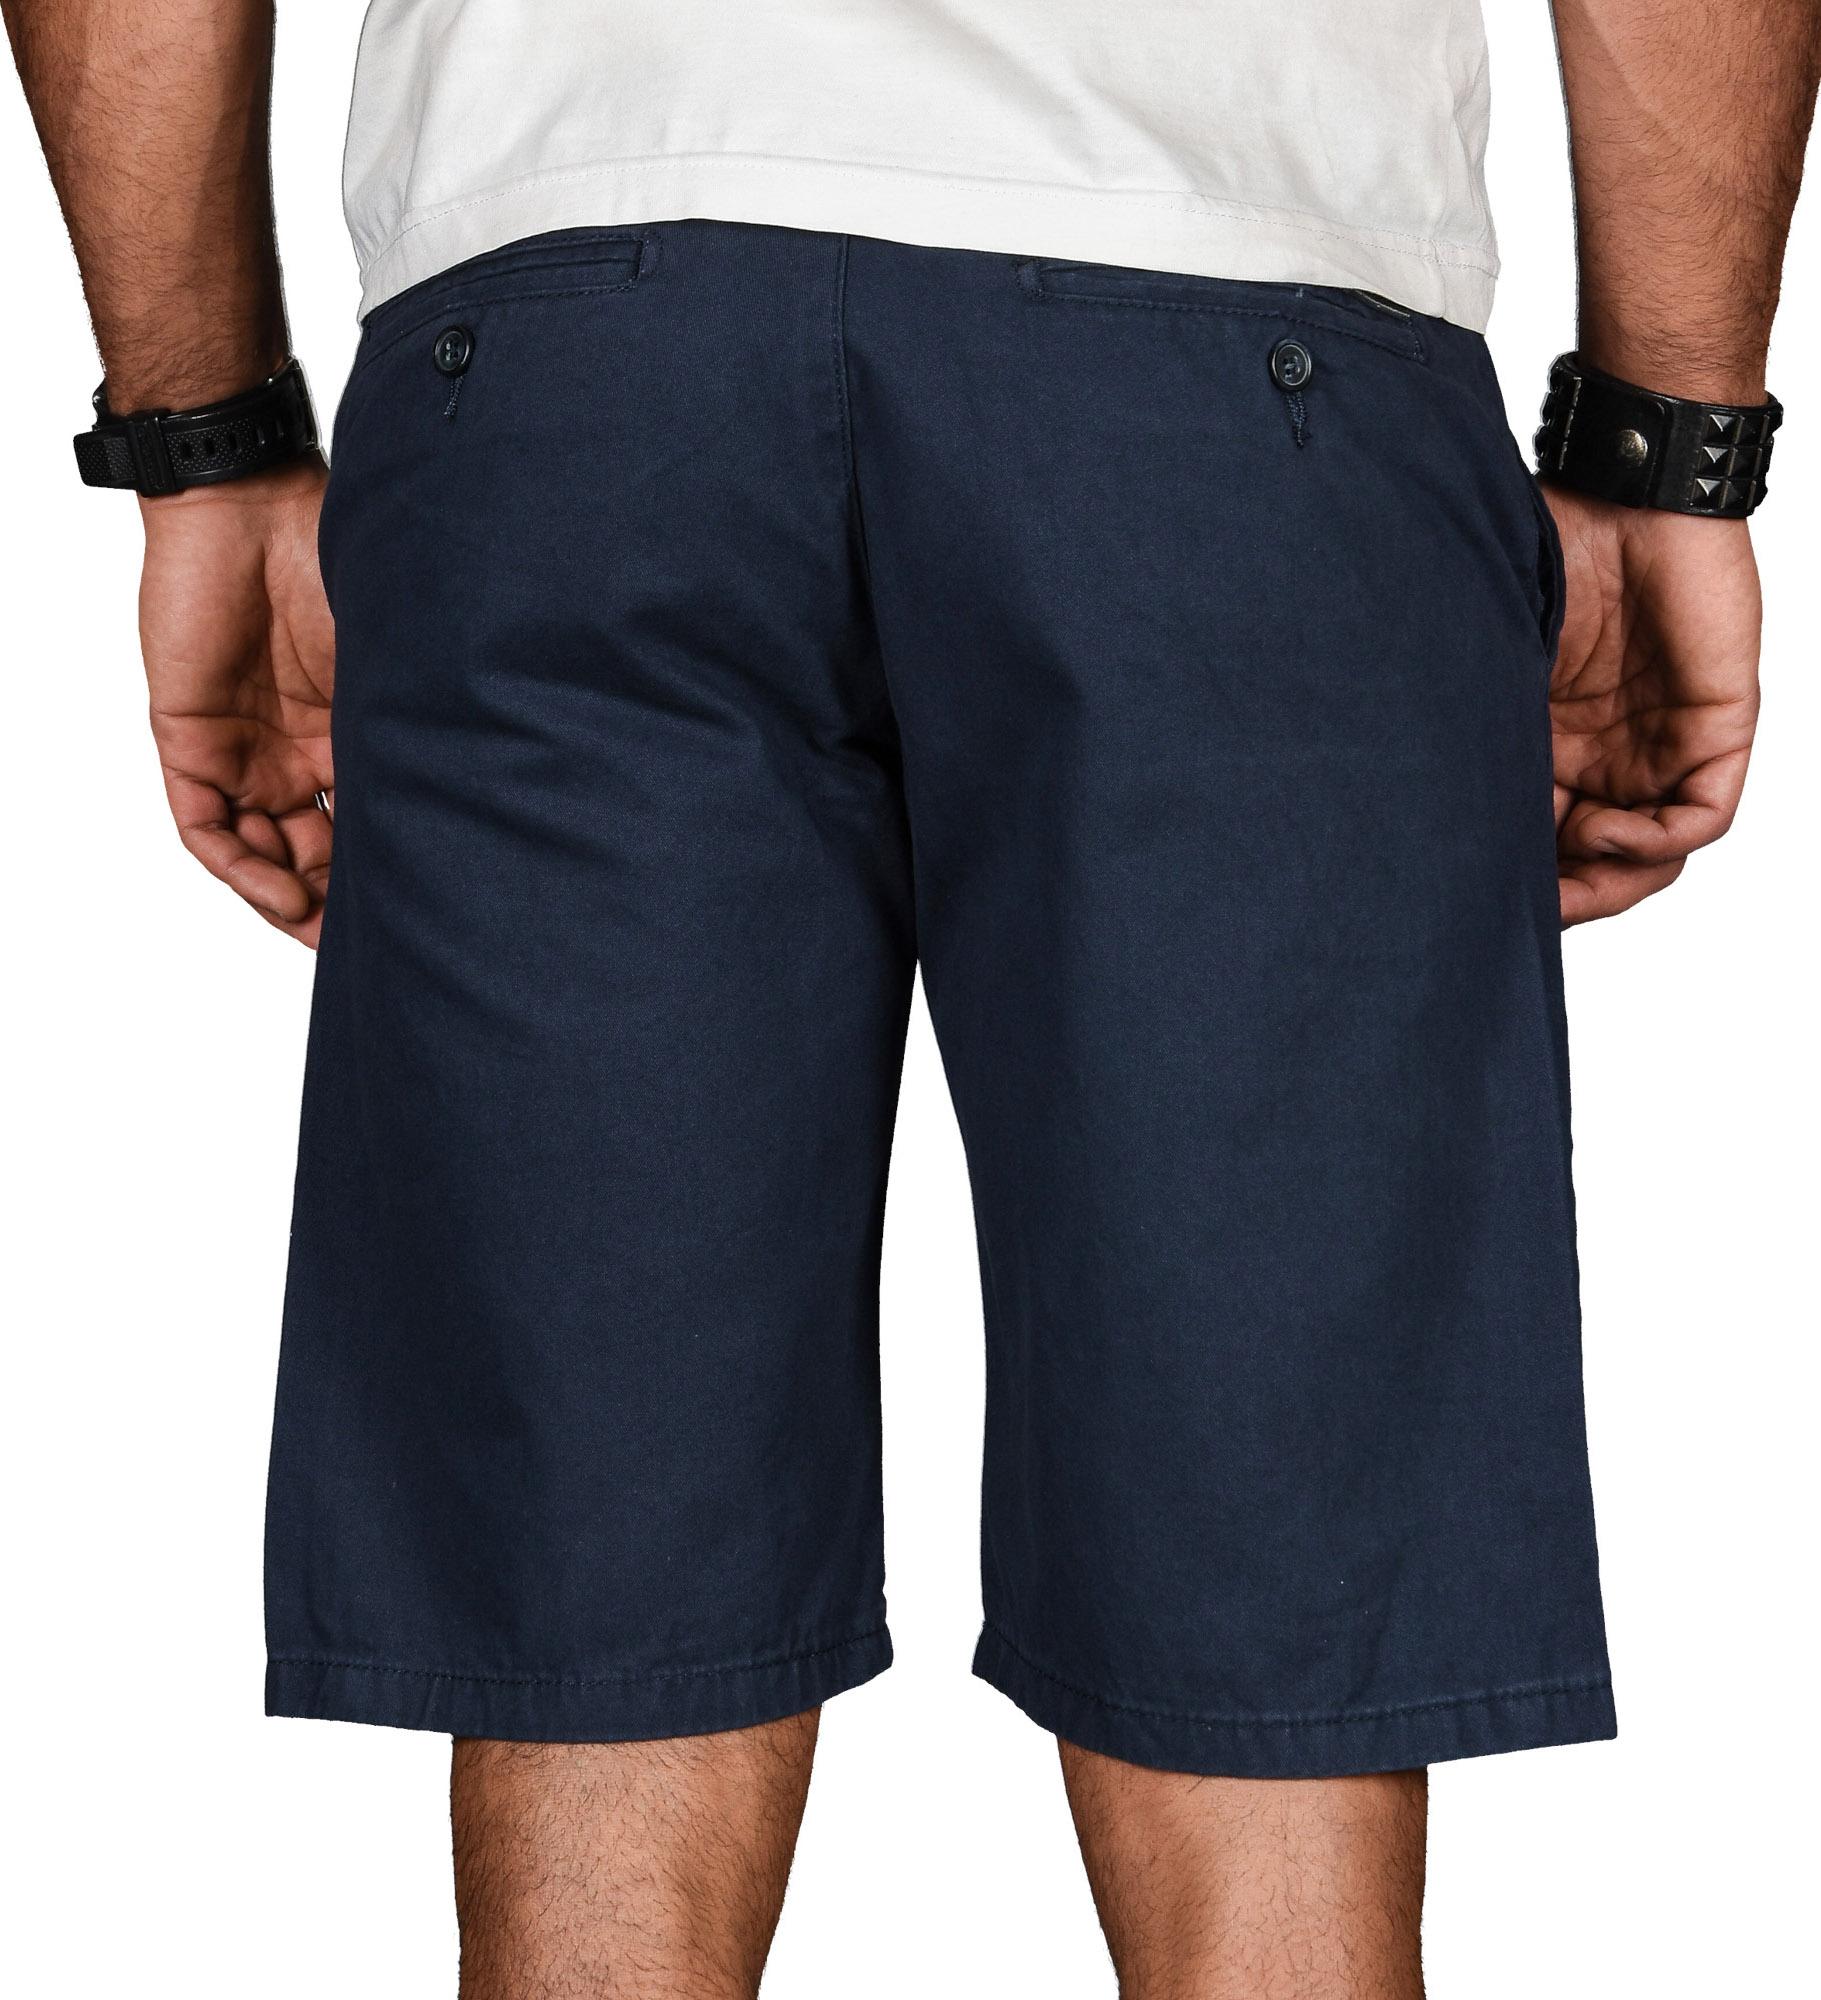 A-Salvarini-Herren-Shorts-kurze-Sommer-Hose-mit-Guertel-Short-Bermuda-NEU-AS096 Indexbild 11